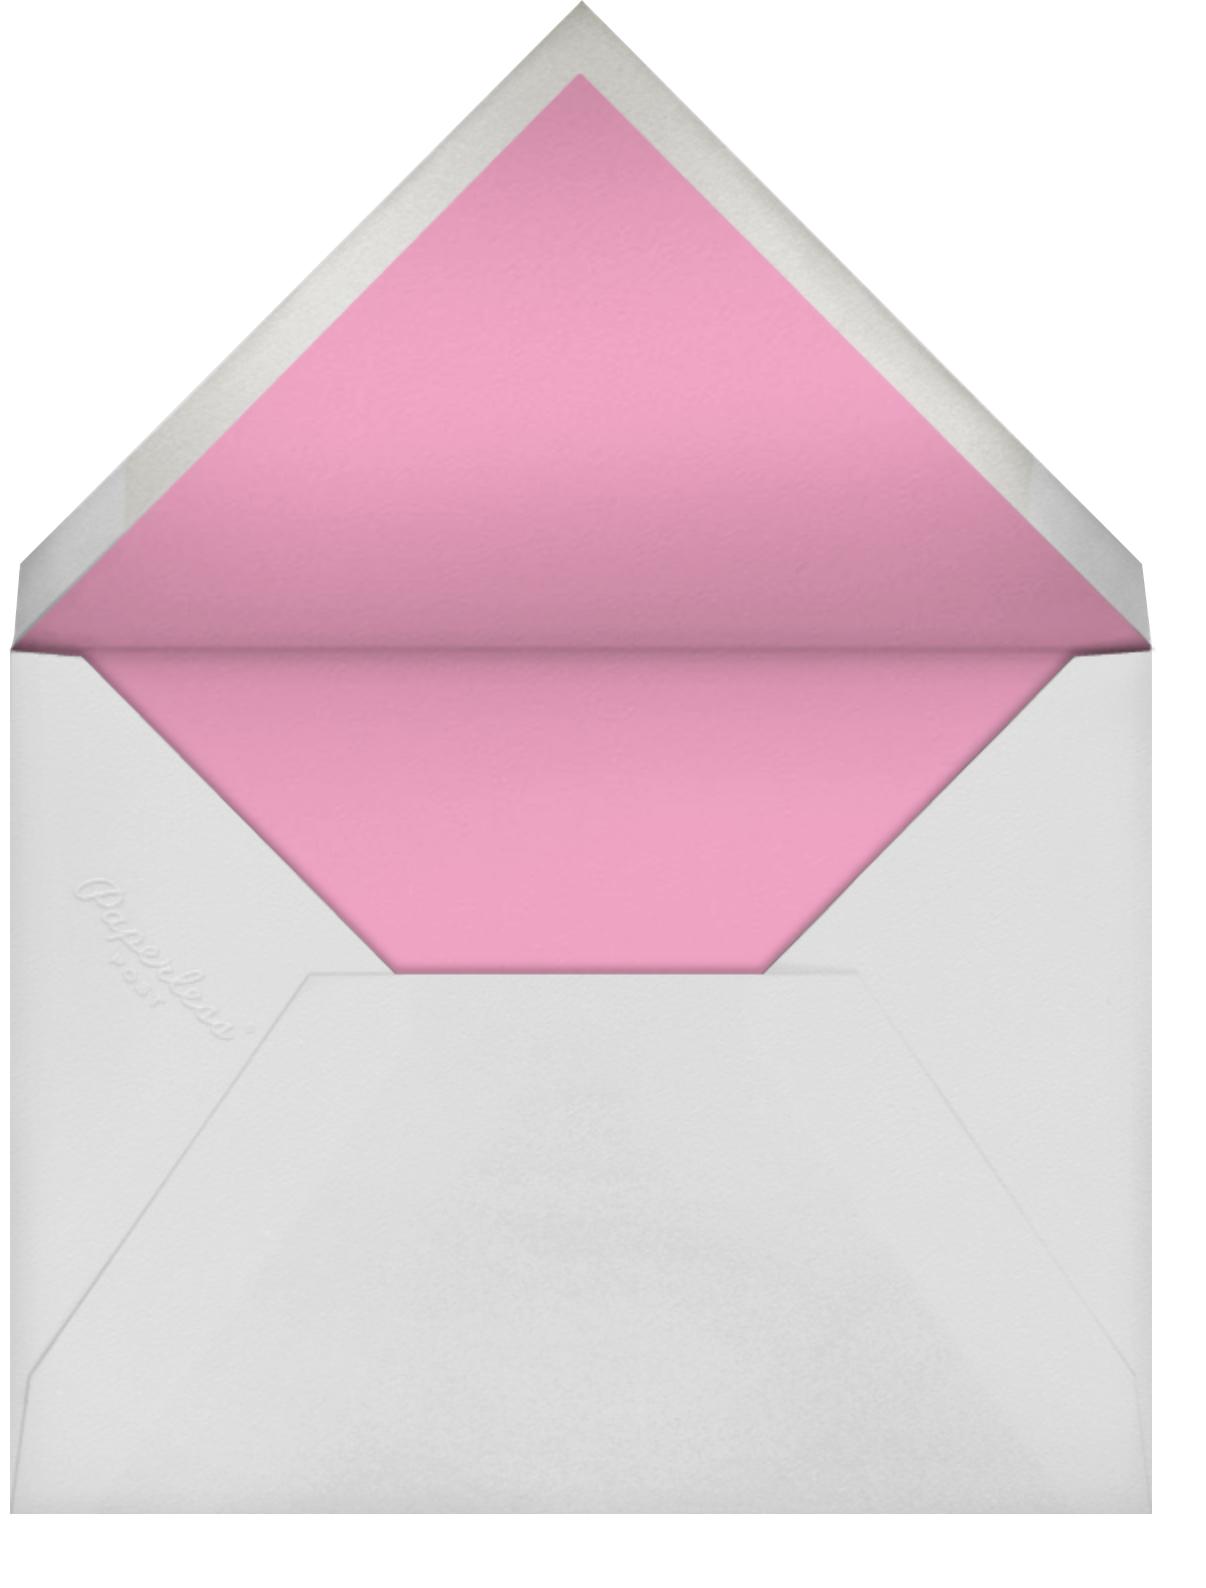 Paris Balloons (Josie Portillo) - Red Cap Cards - Designs we love - envelope back